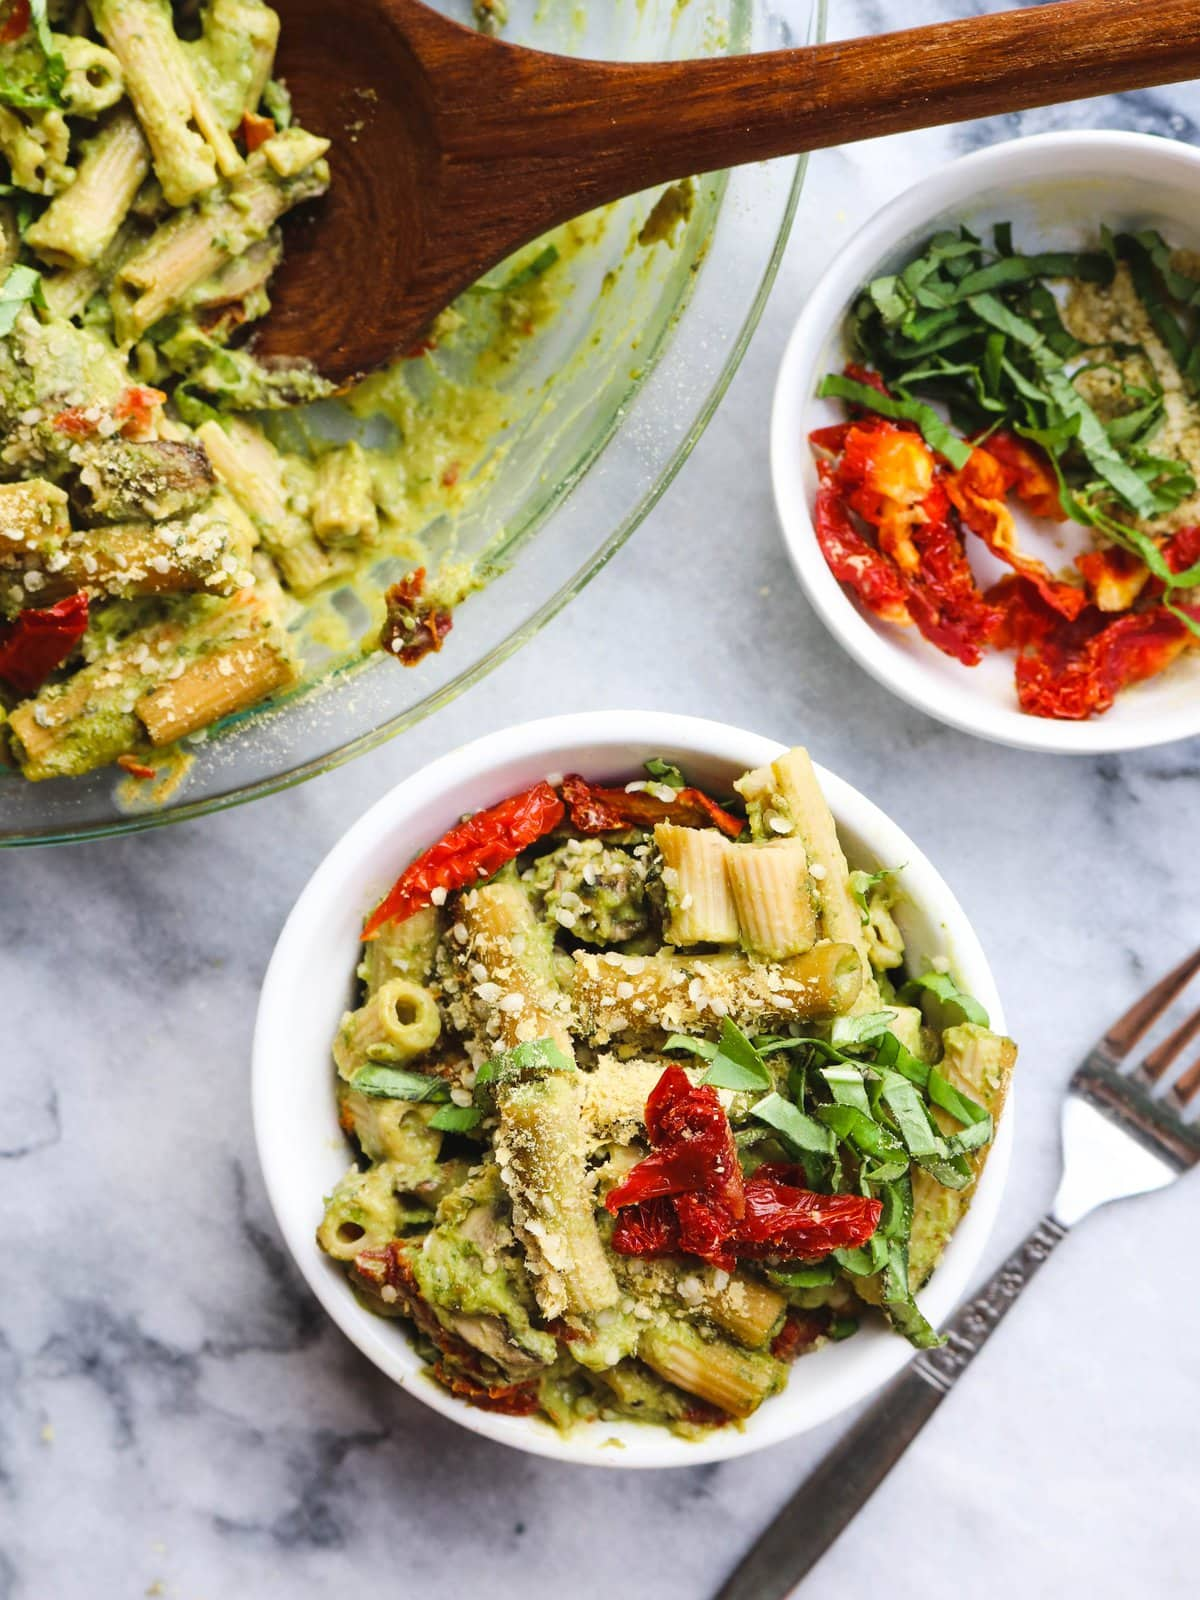 Creamy_Vegan_Pesto_Pasta_Bake_Avocado_SundriedTomato_GlutenFree_FromMyBowl-5